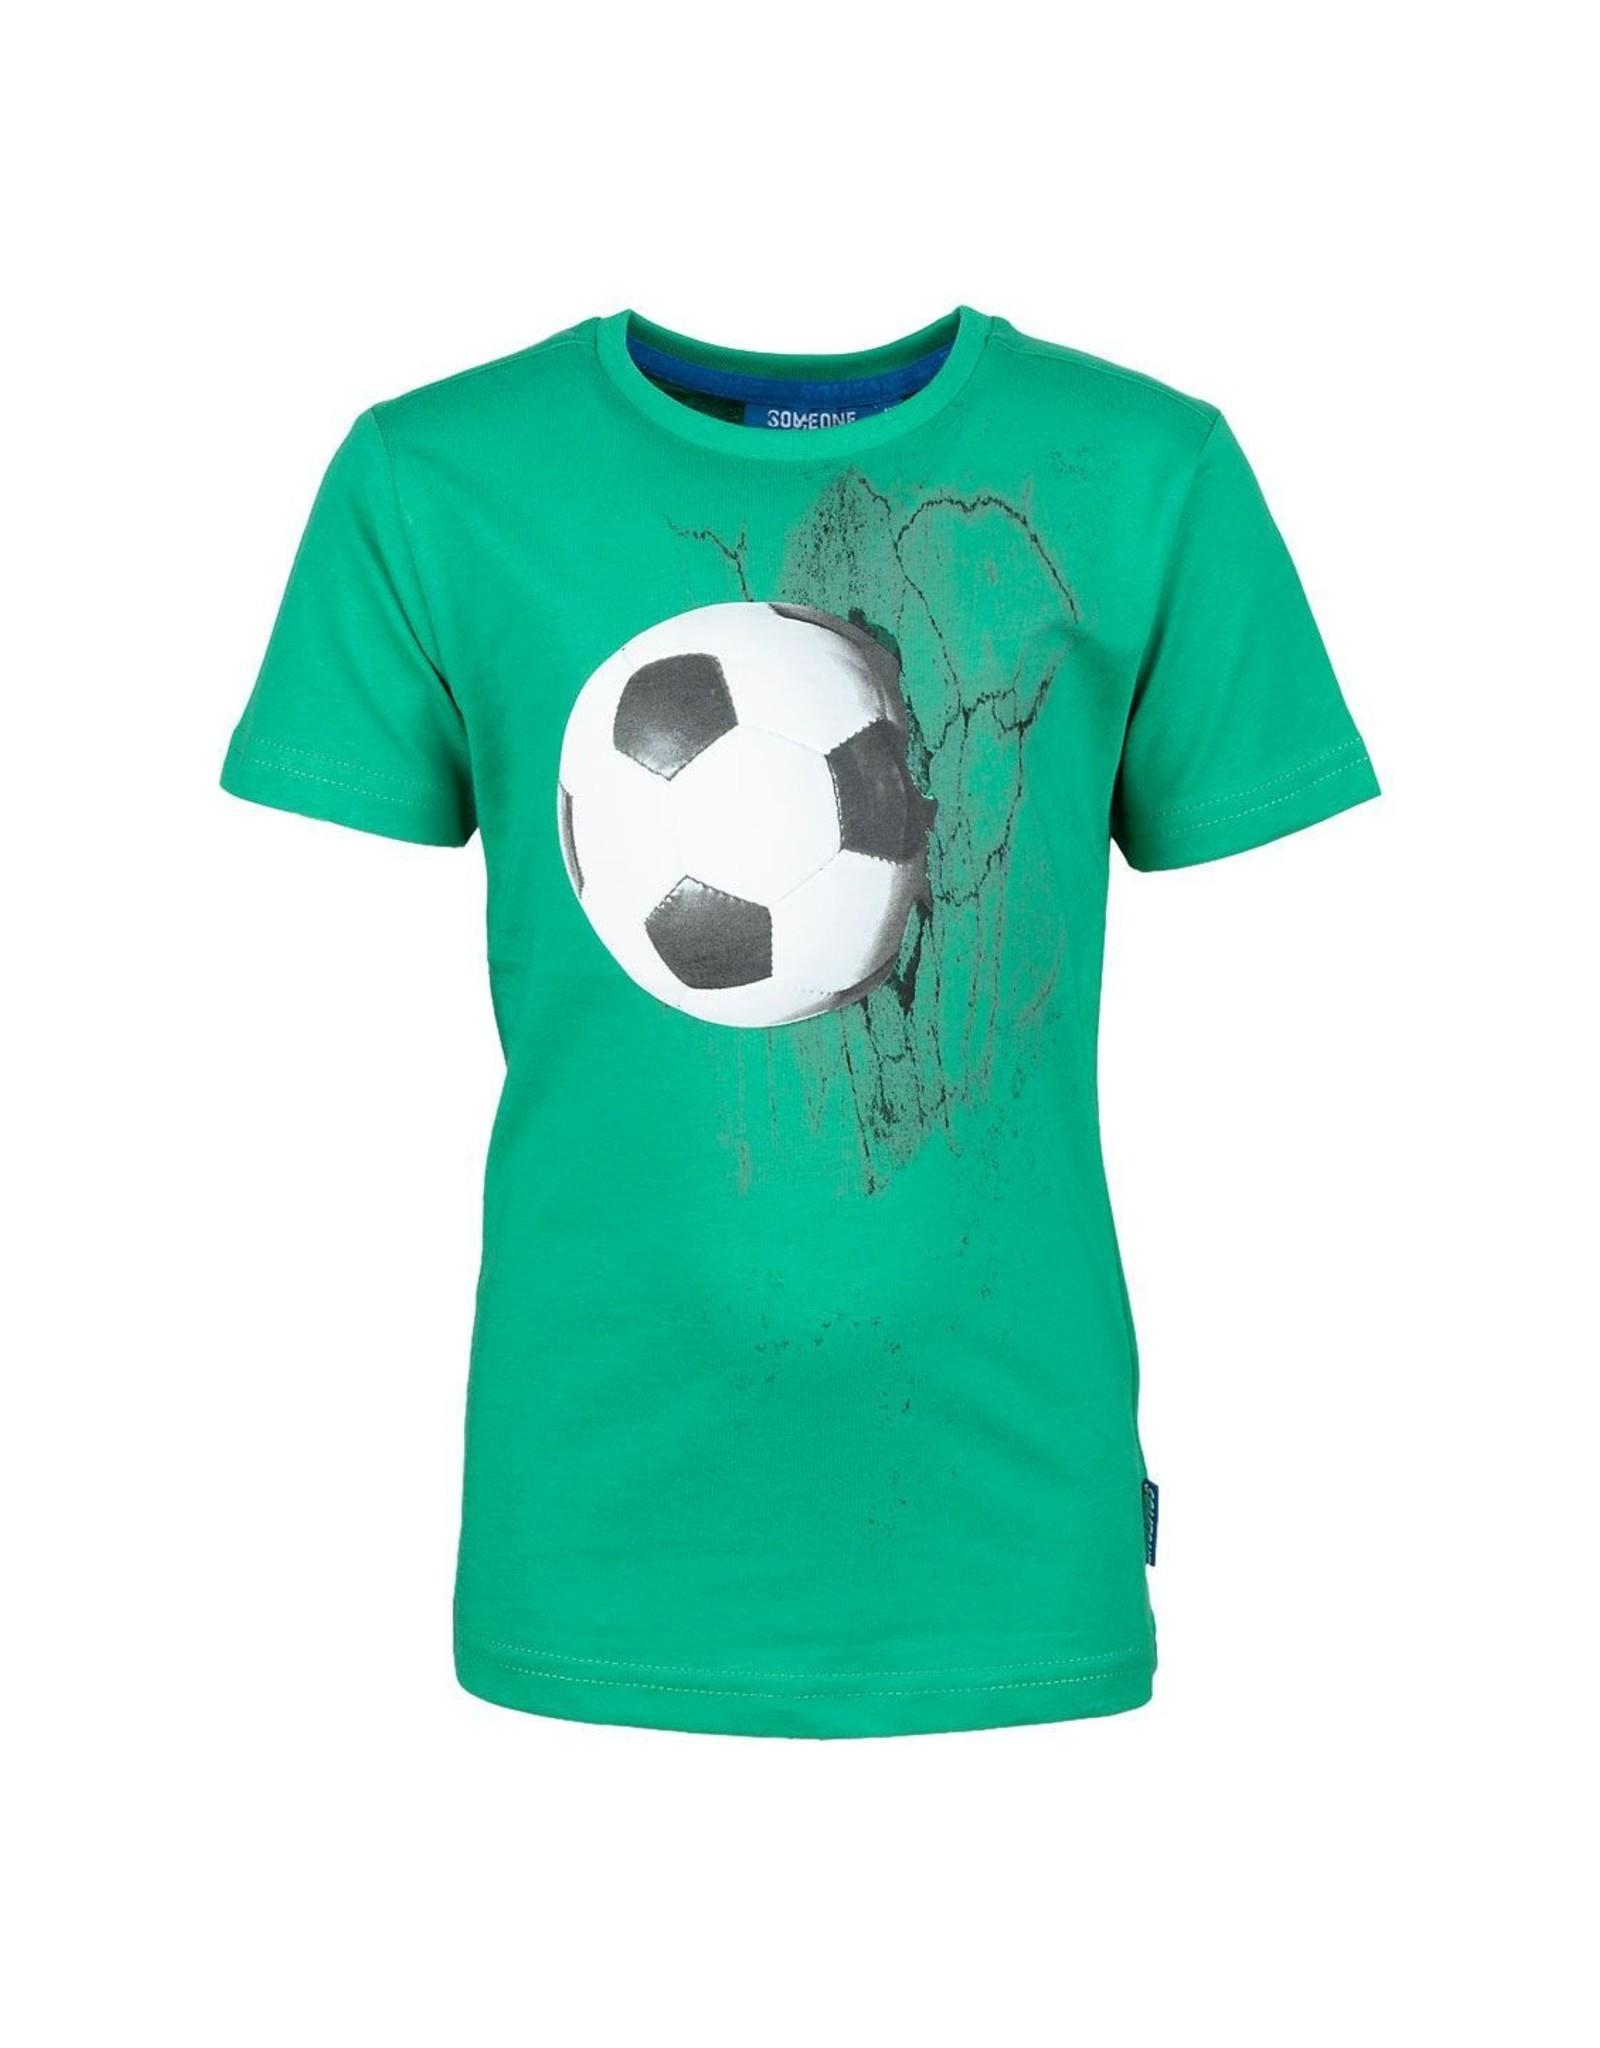 Someone FOOSBALL-SB-02-B Green